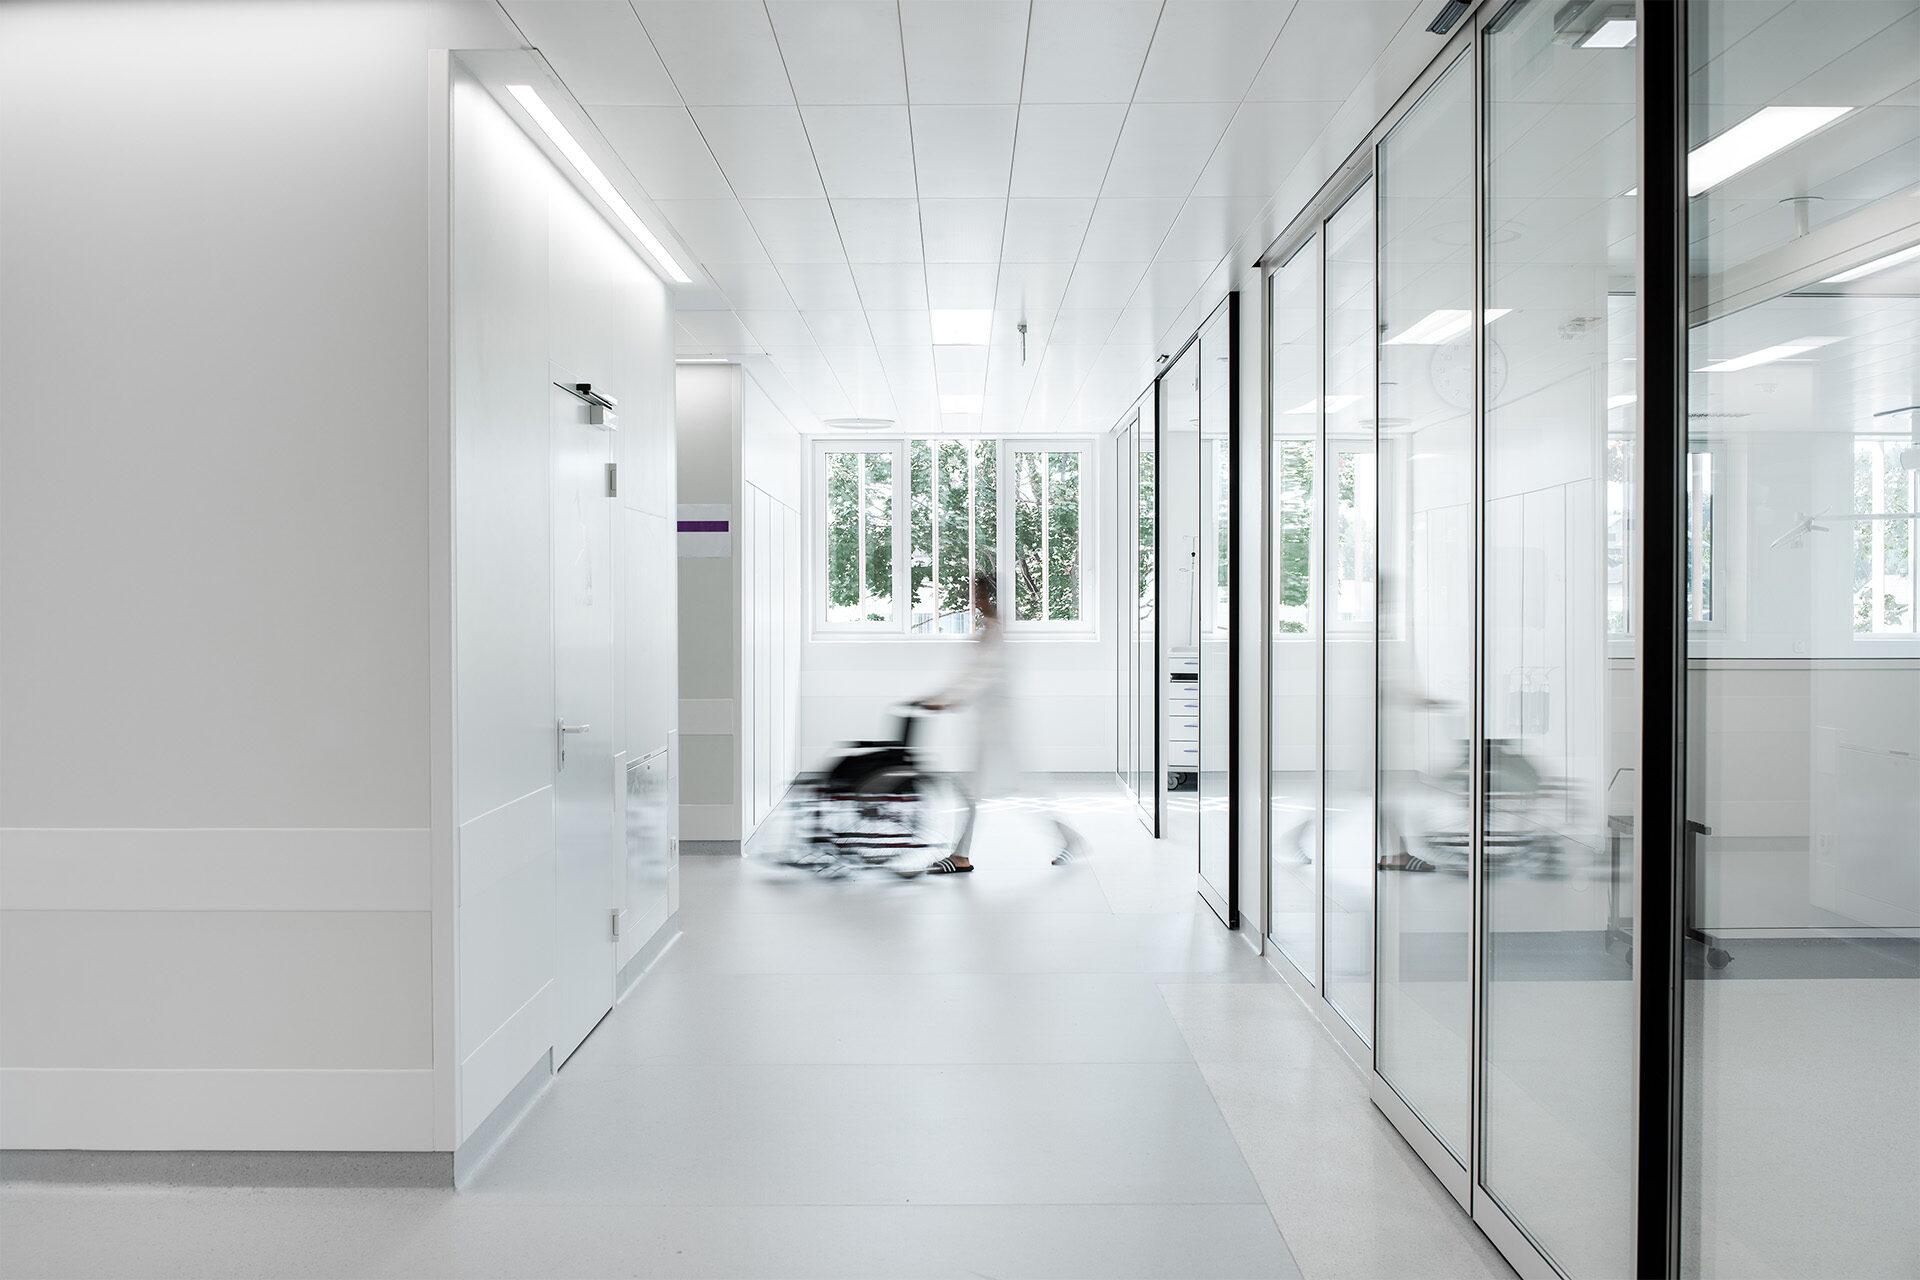 A1 Intensive care hospital Novo mesto